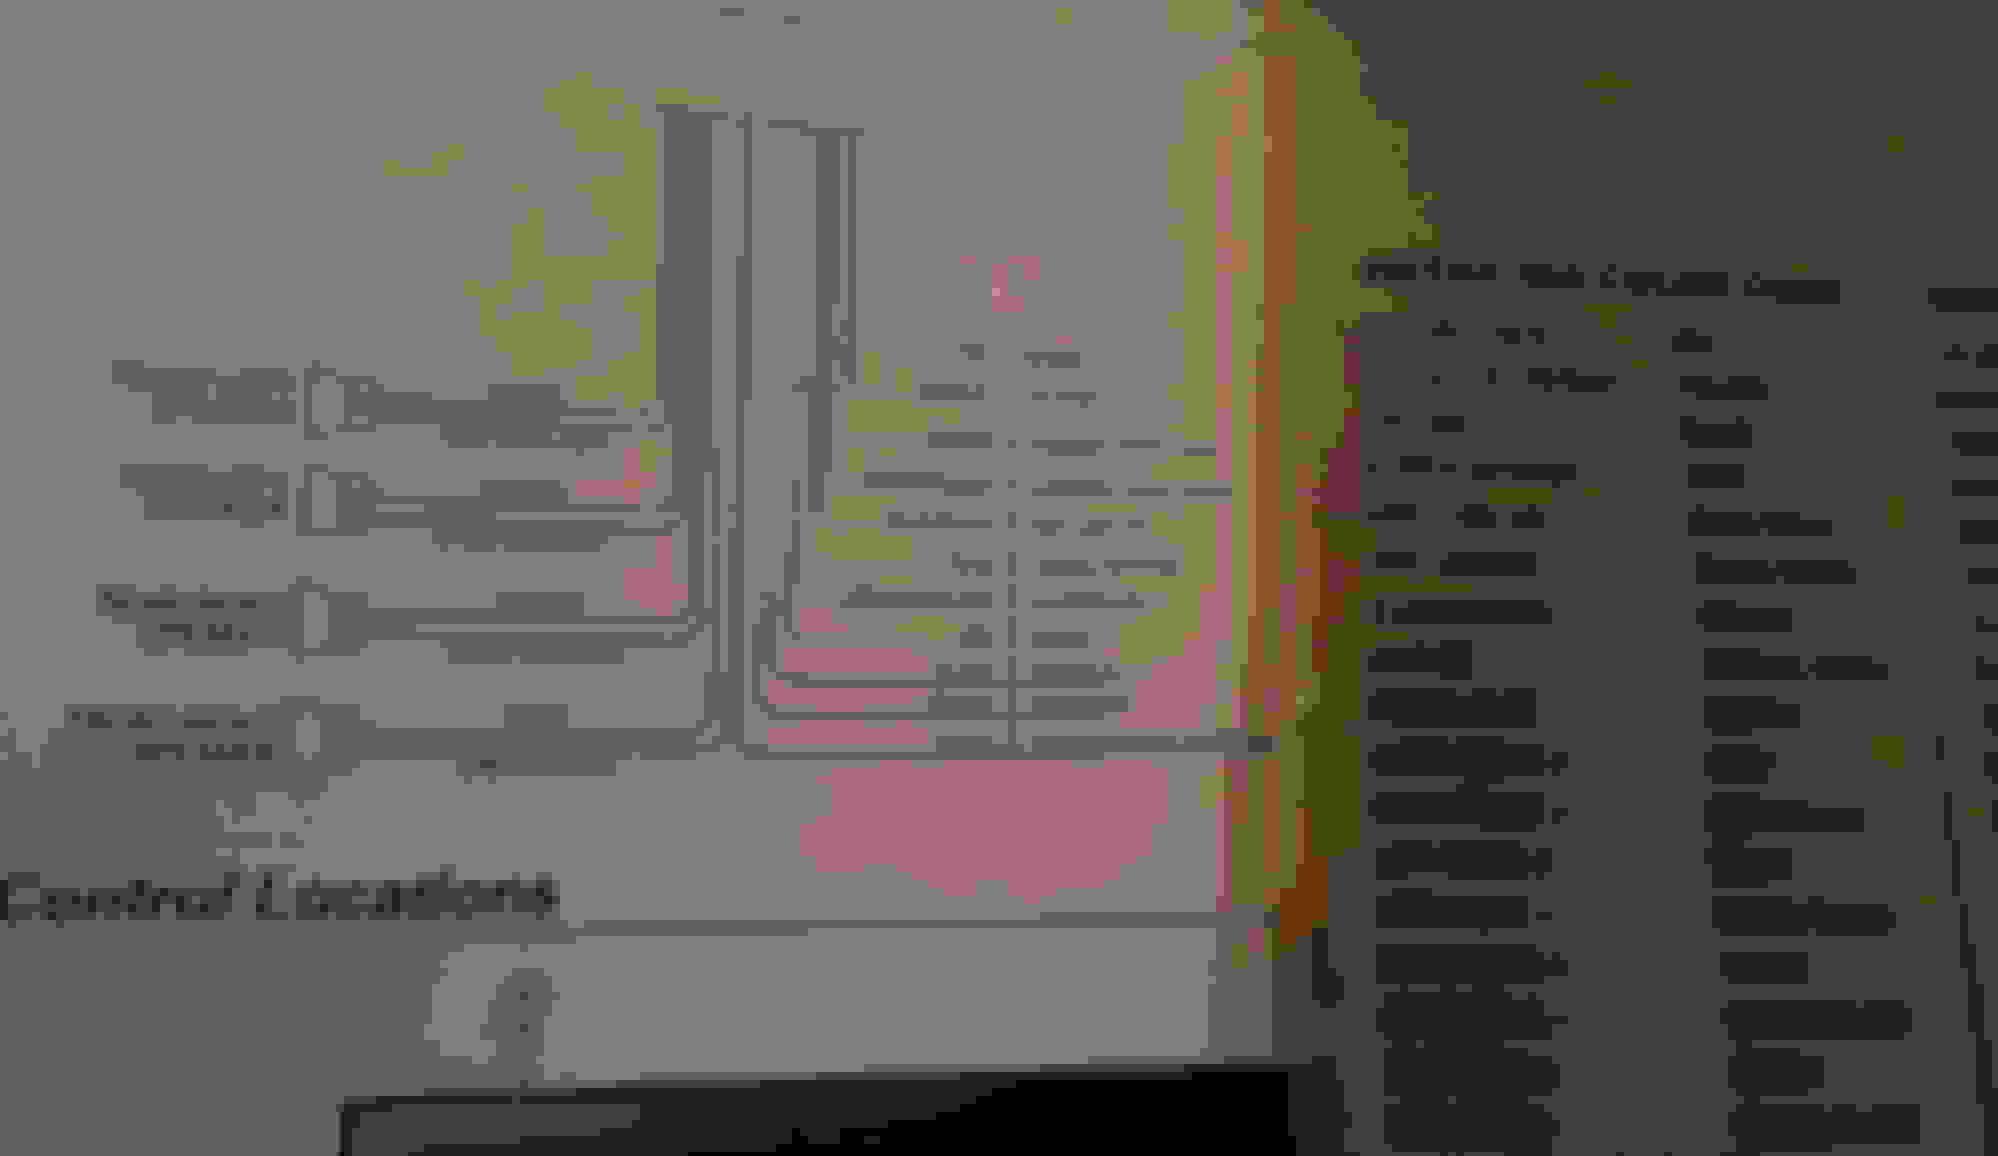 Wiring Diagram For Honda Odyssey 2007 Opinions About Atv 1998 Electrical Schematics Rh Zavoral Genealogy Com 06 Ac Diagrams